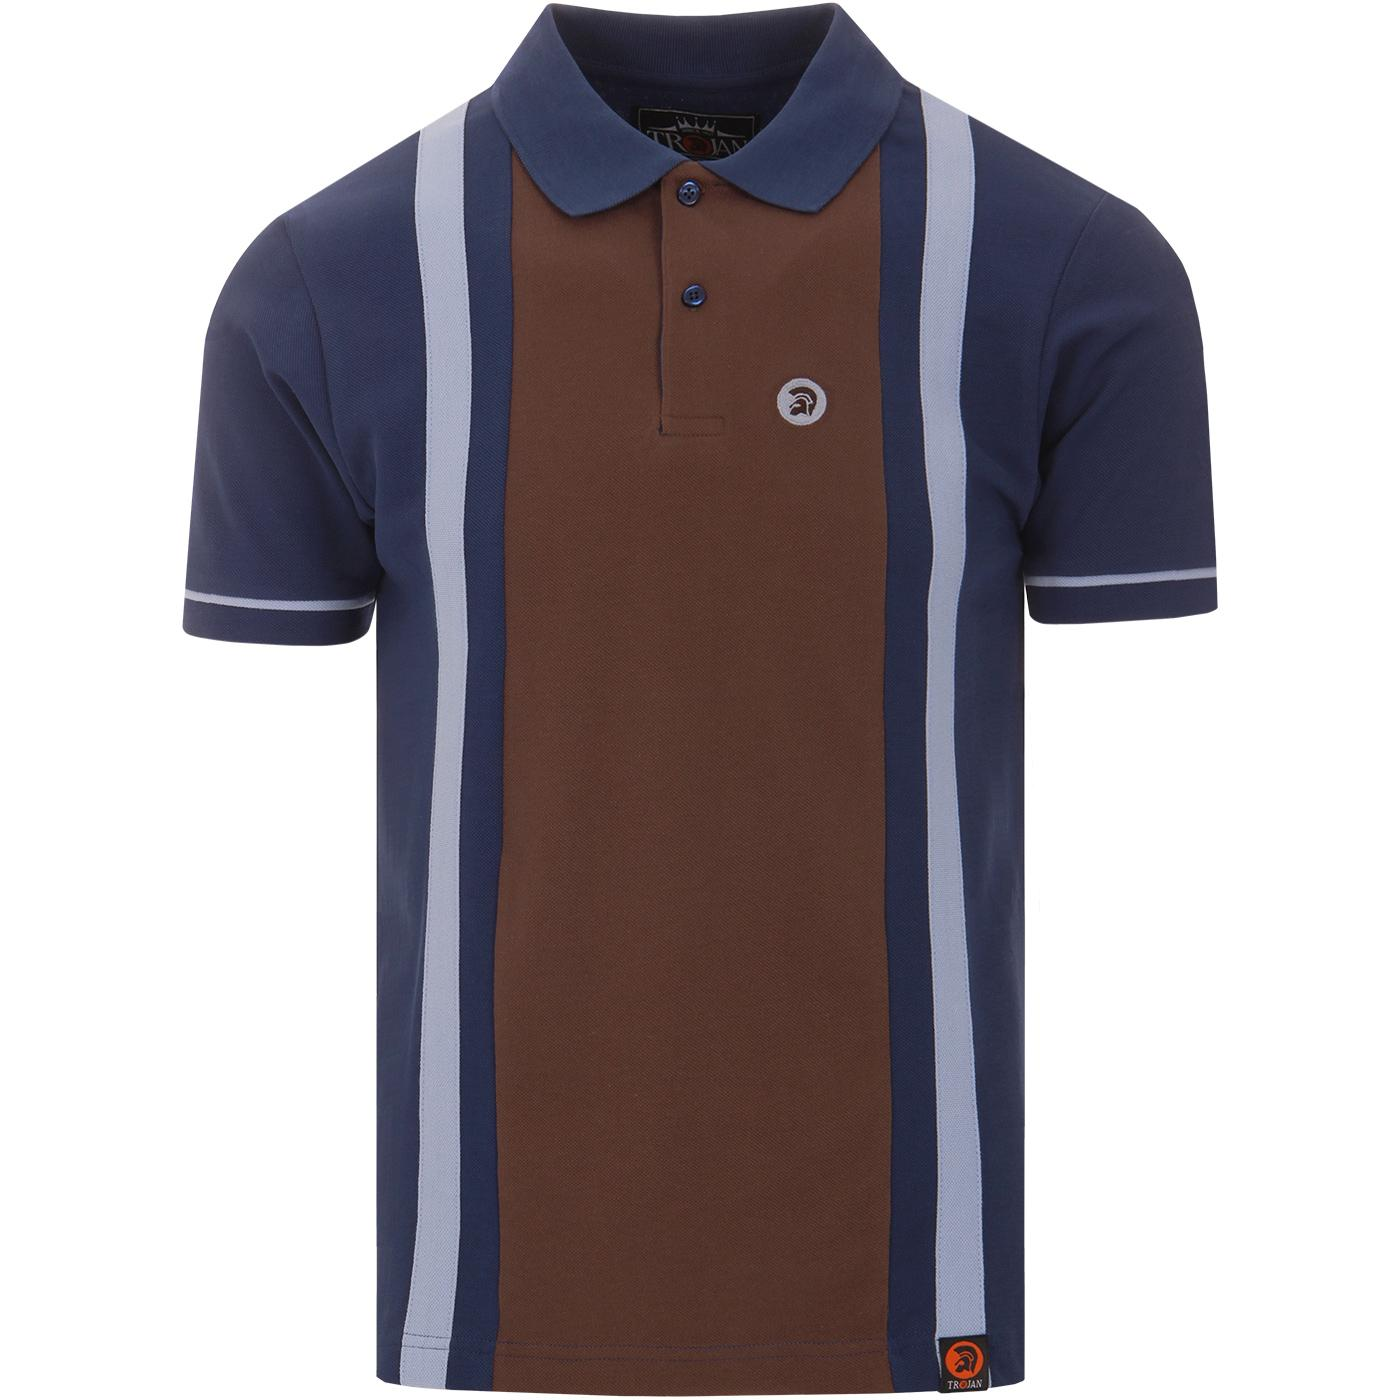 TROJAN RECORDS Retro Mod Pique Panel Polo Shirt EB